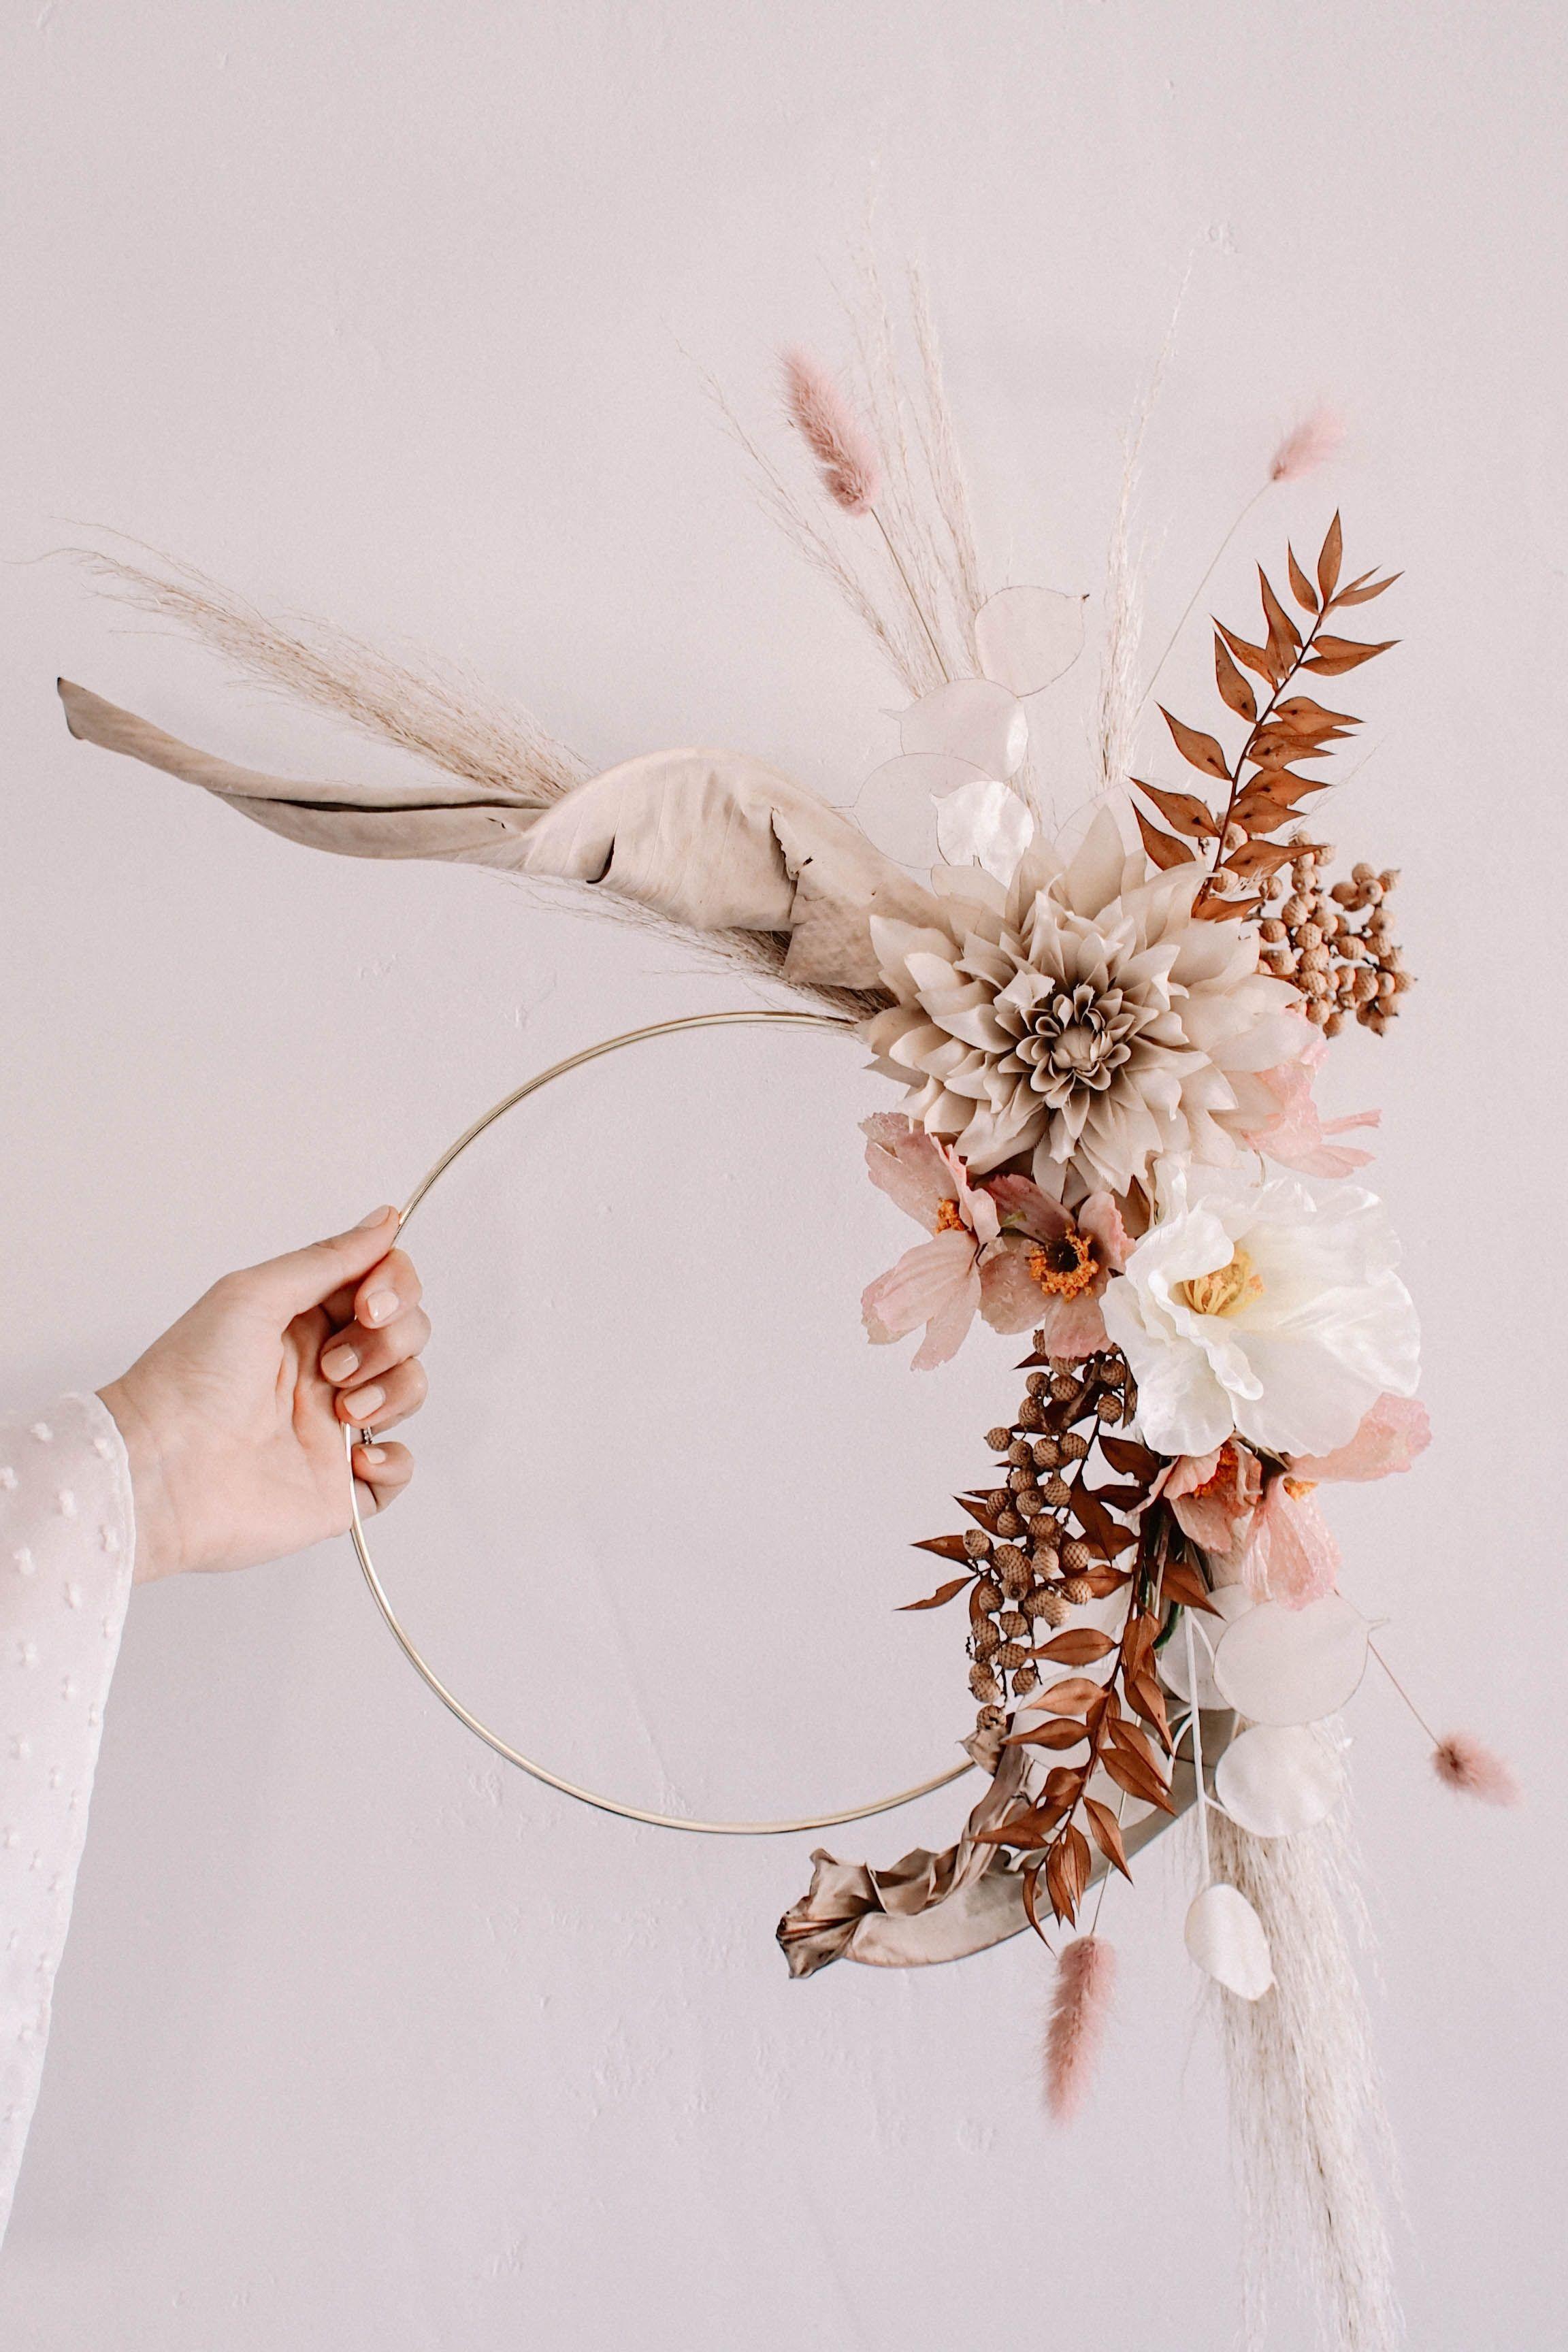 Create a simple DIY hoop wreath with dried flowers from Afloral.com. #driedflower #DIYwreath #driedflowerwreath